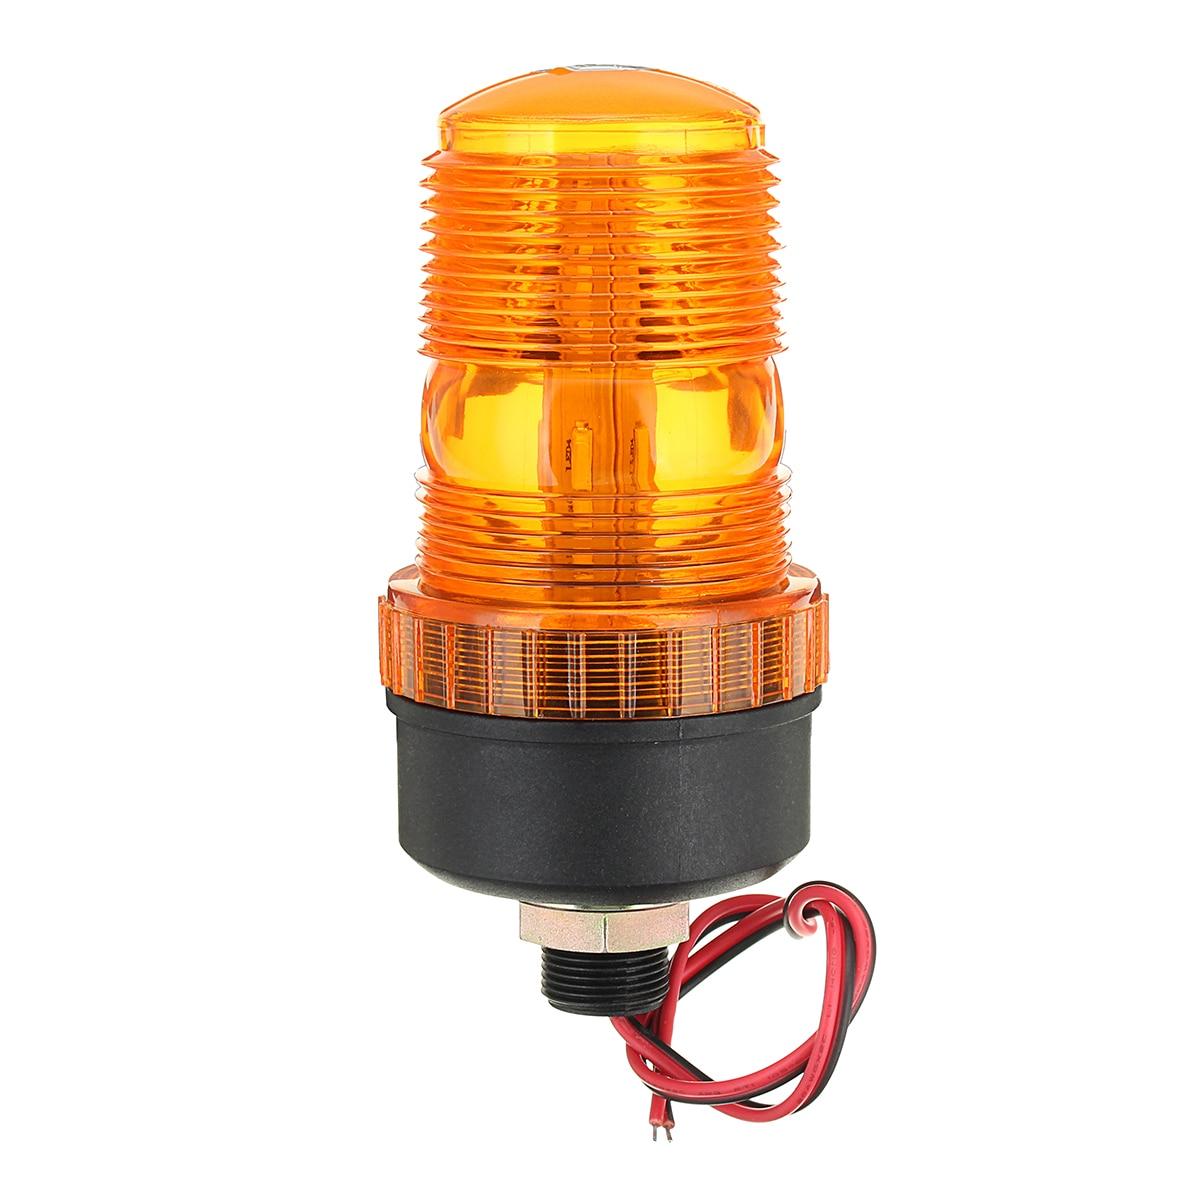 12V 24V LED Rotating Flashing Amber Beacon Flexible Strobe Tractor Warning Light Traffic Light Roadway Safety